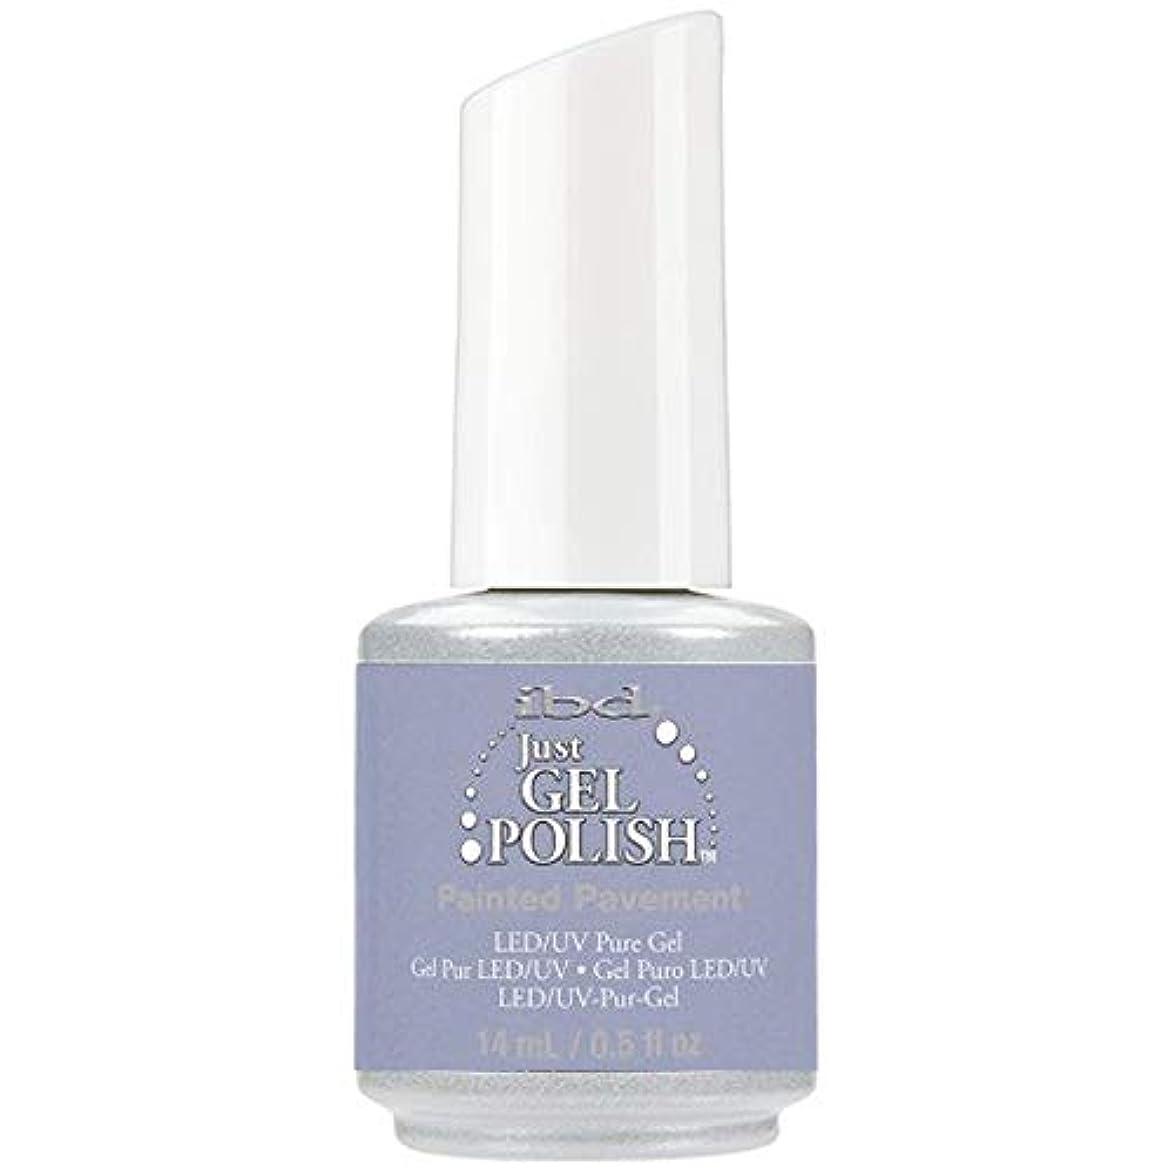 ibd Just Gel Nail Polish - Painted Pavement - 14ml / 0.5oz